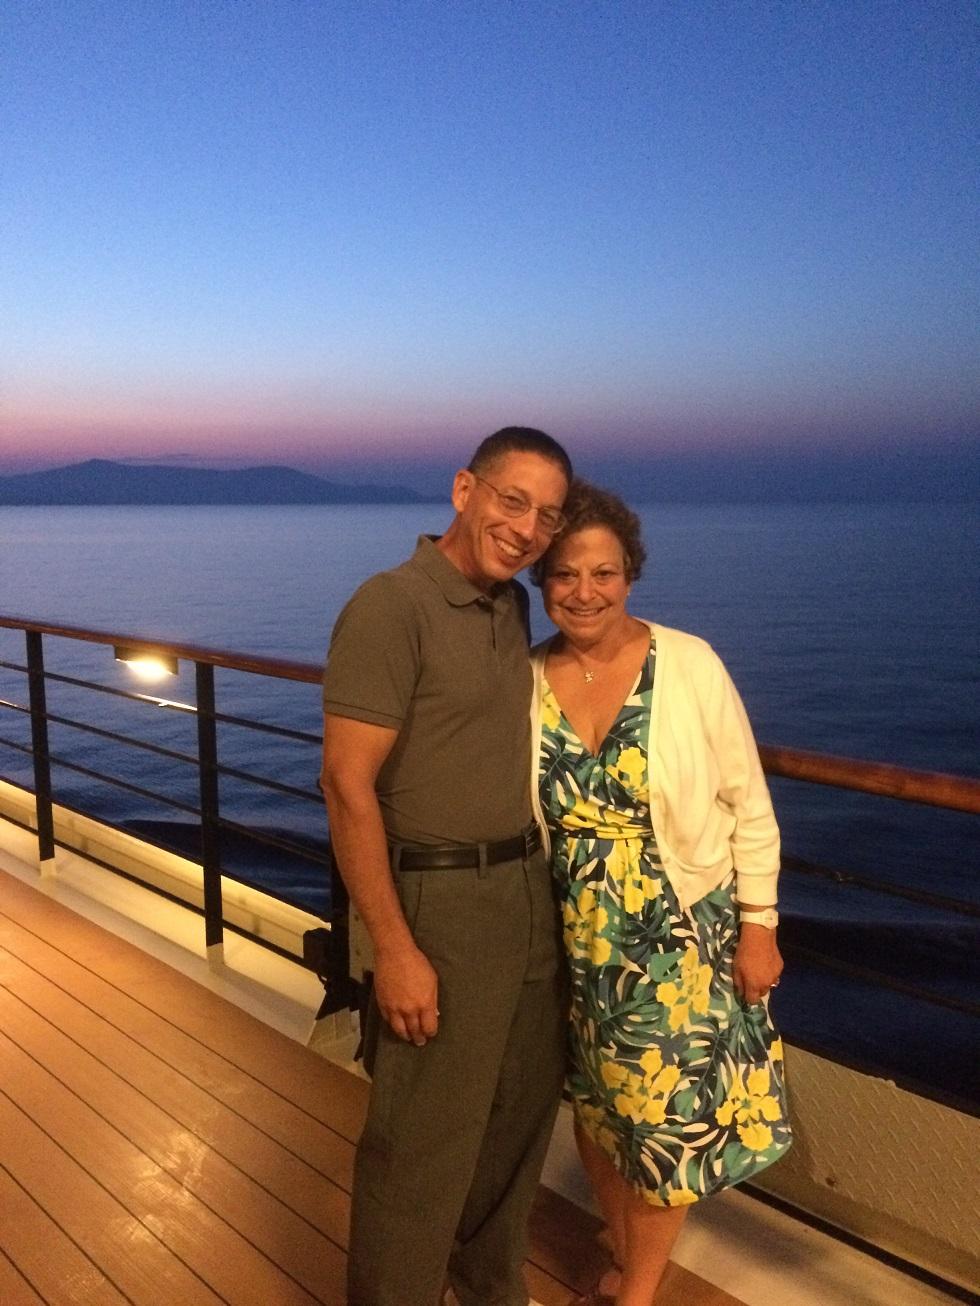 Ron and Gloriana Friedman